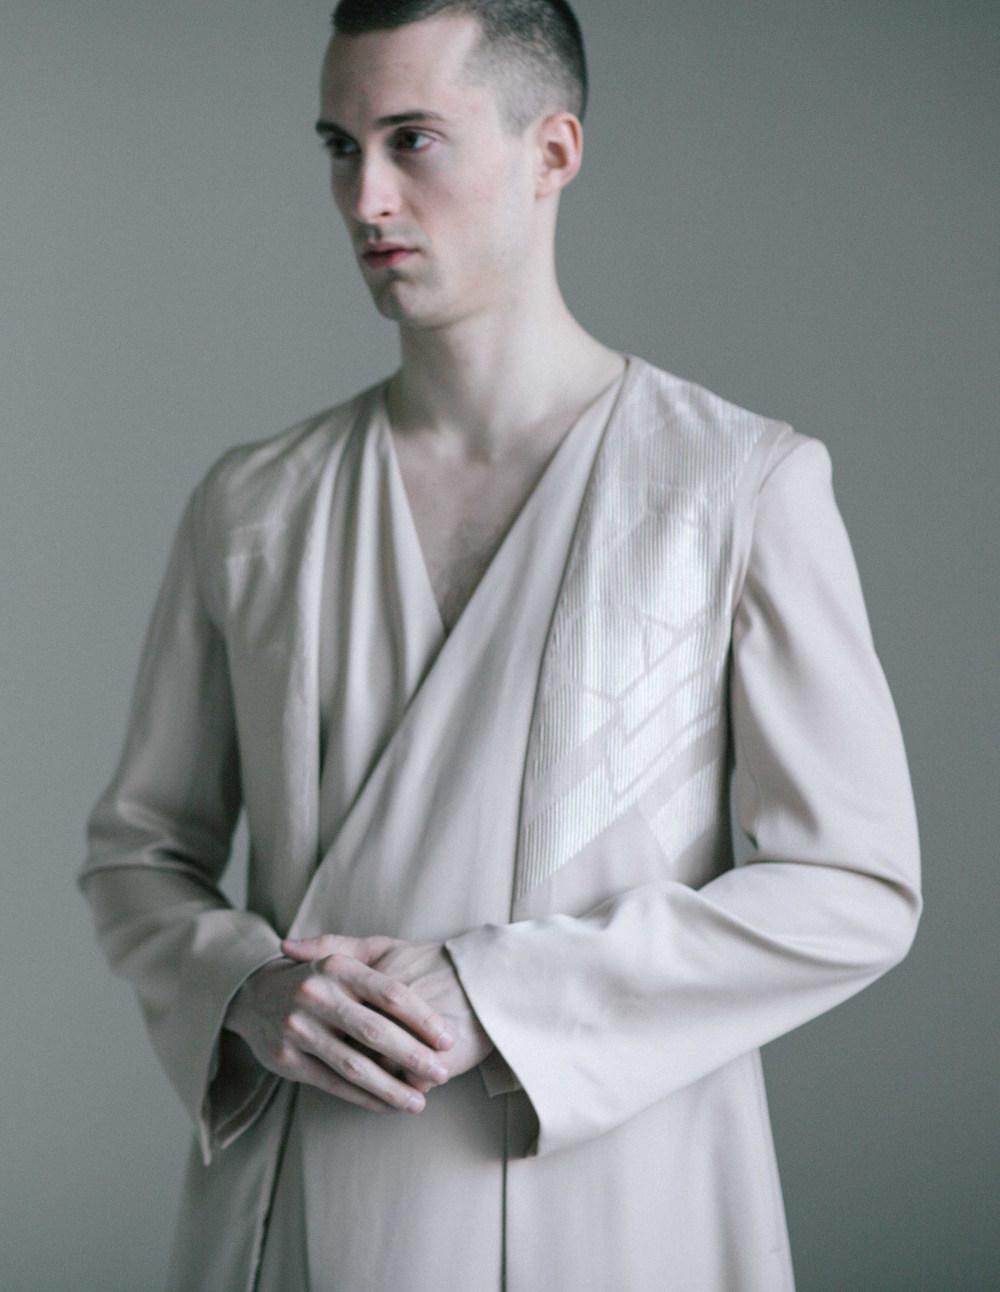 anna-kim-kadinsky-double-layered-tailored-coat-agoraphobia-collective